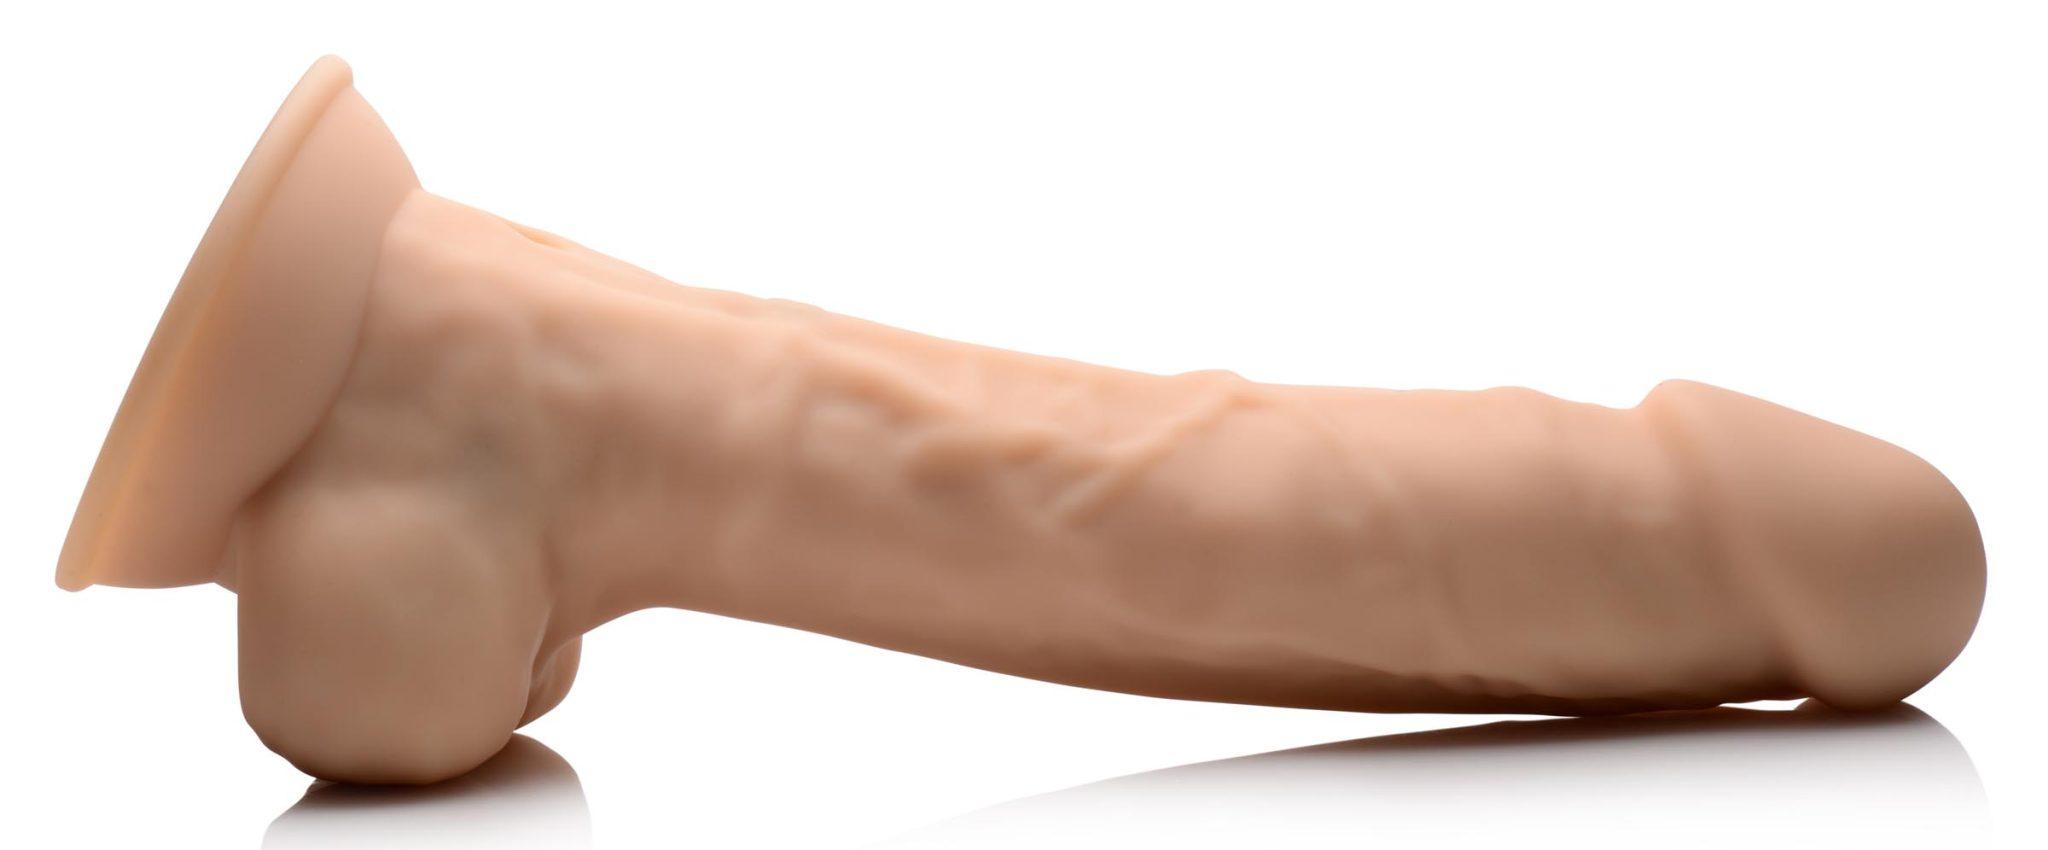 8 Inch Silexpan Hypoallergenic Silicone Vibrating Dildo – Light